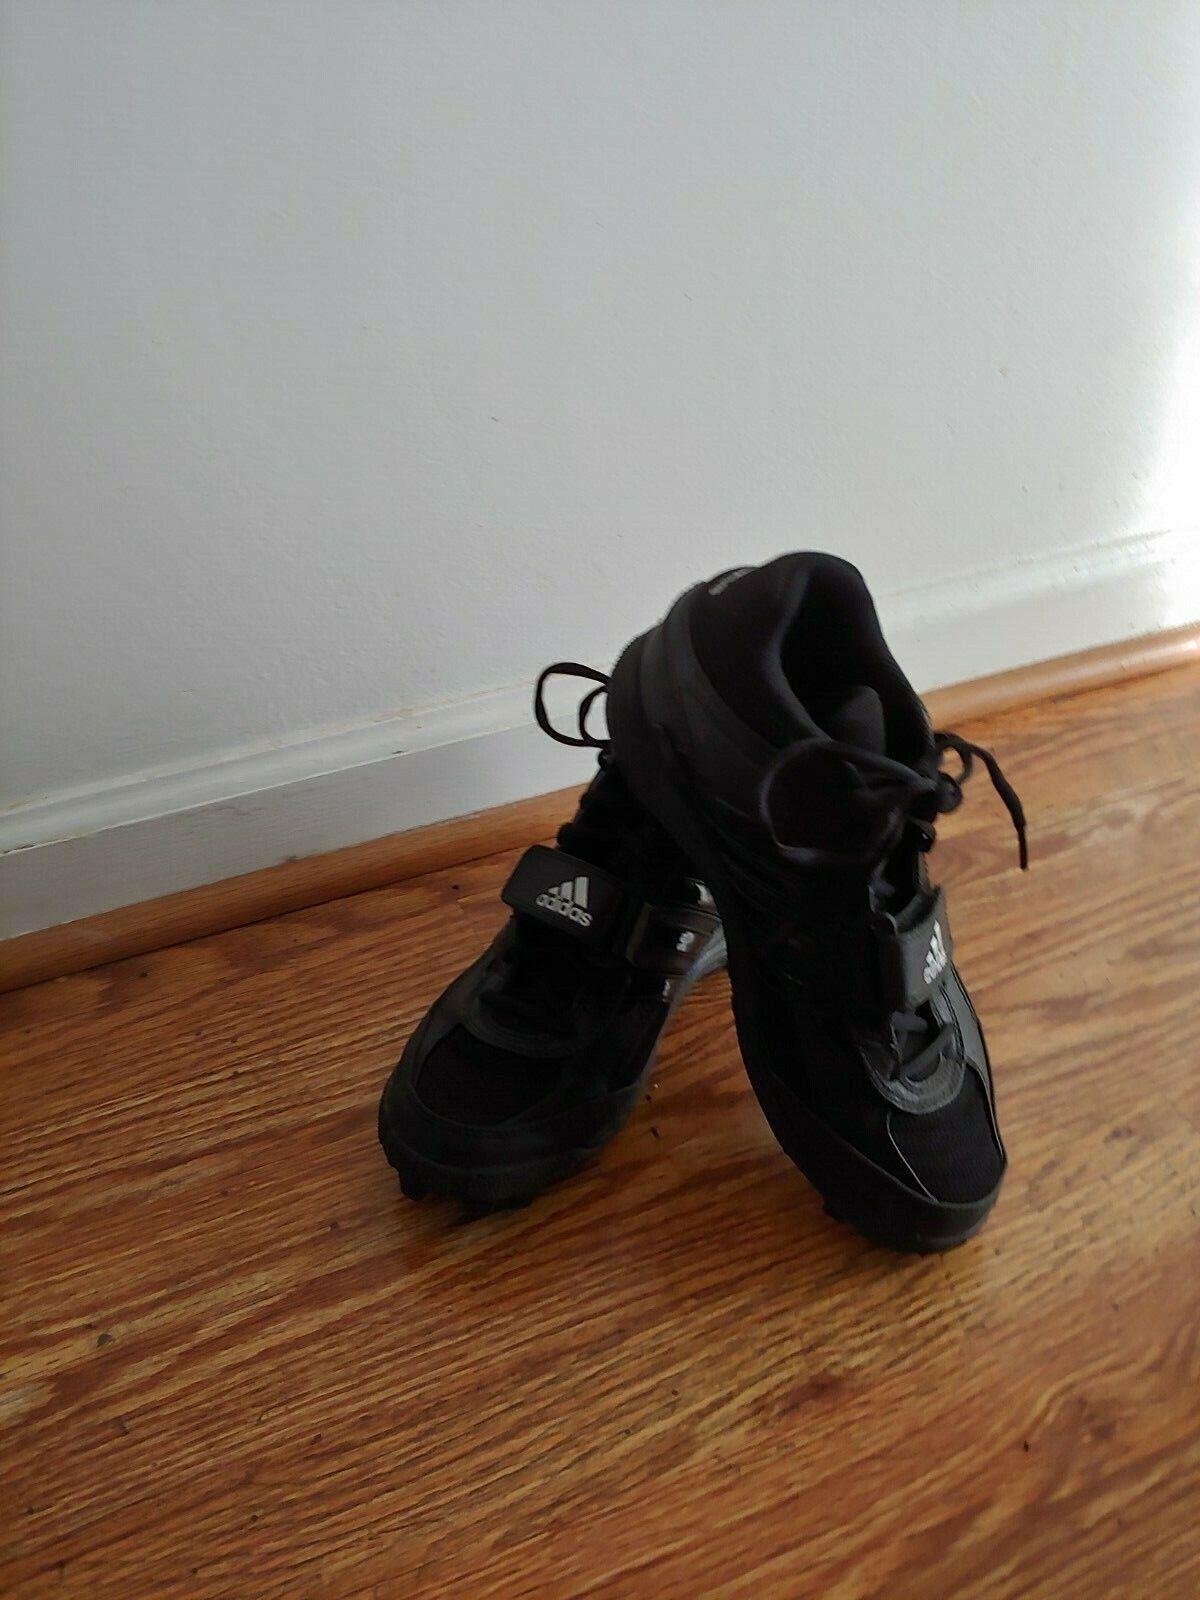 f394f1dbe Blitz Cleats Size 7.5 Adidas Corner nsmyoe6735-Men - www ...